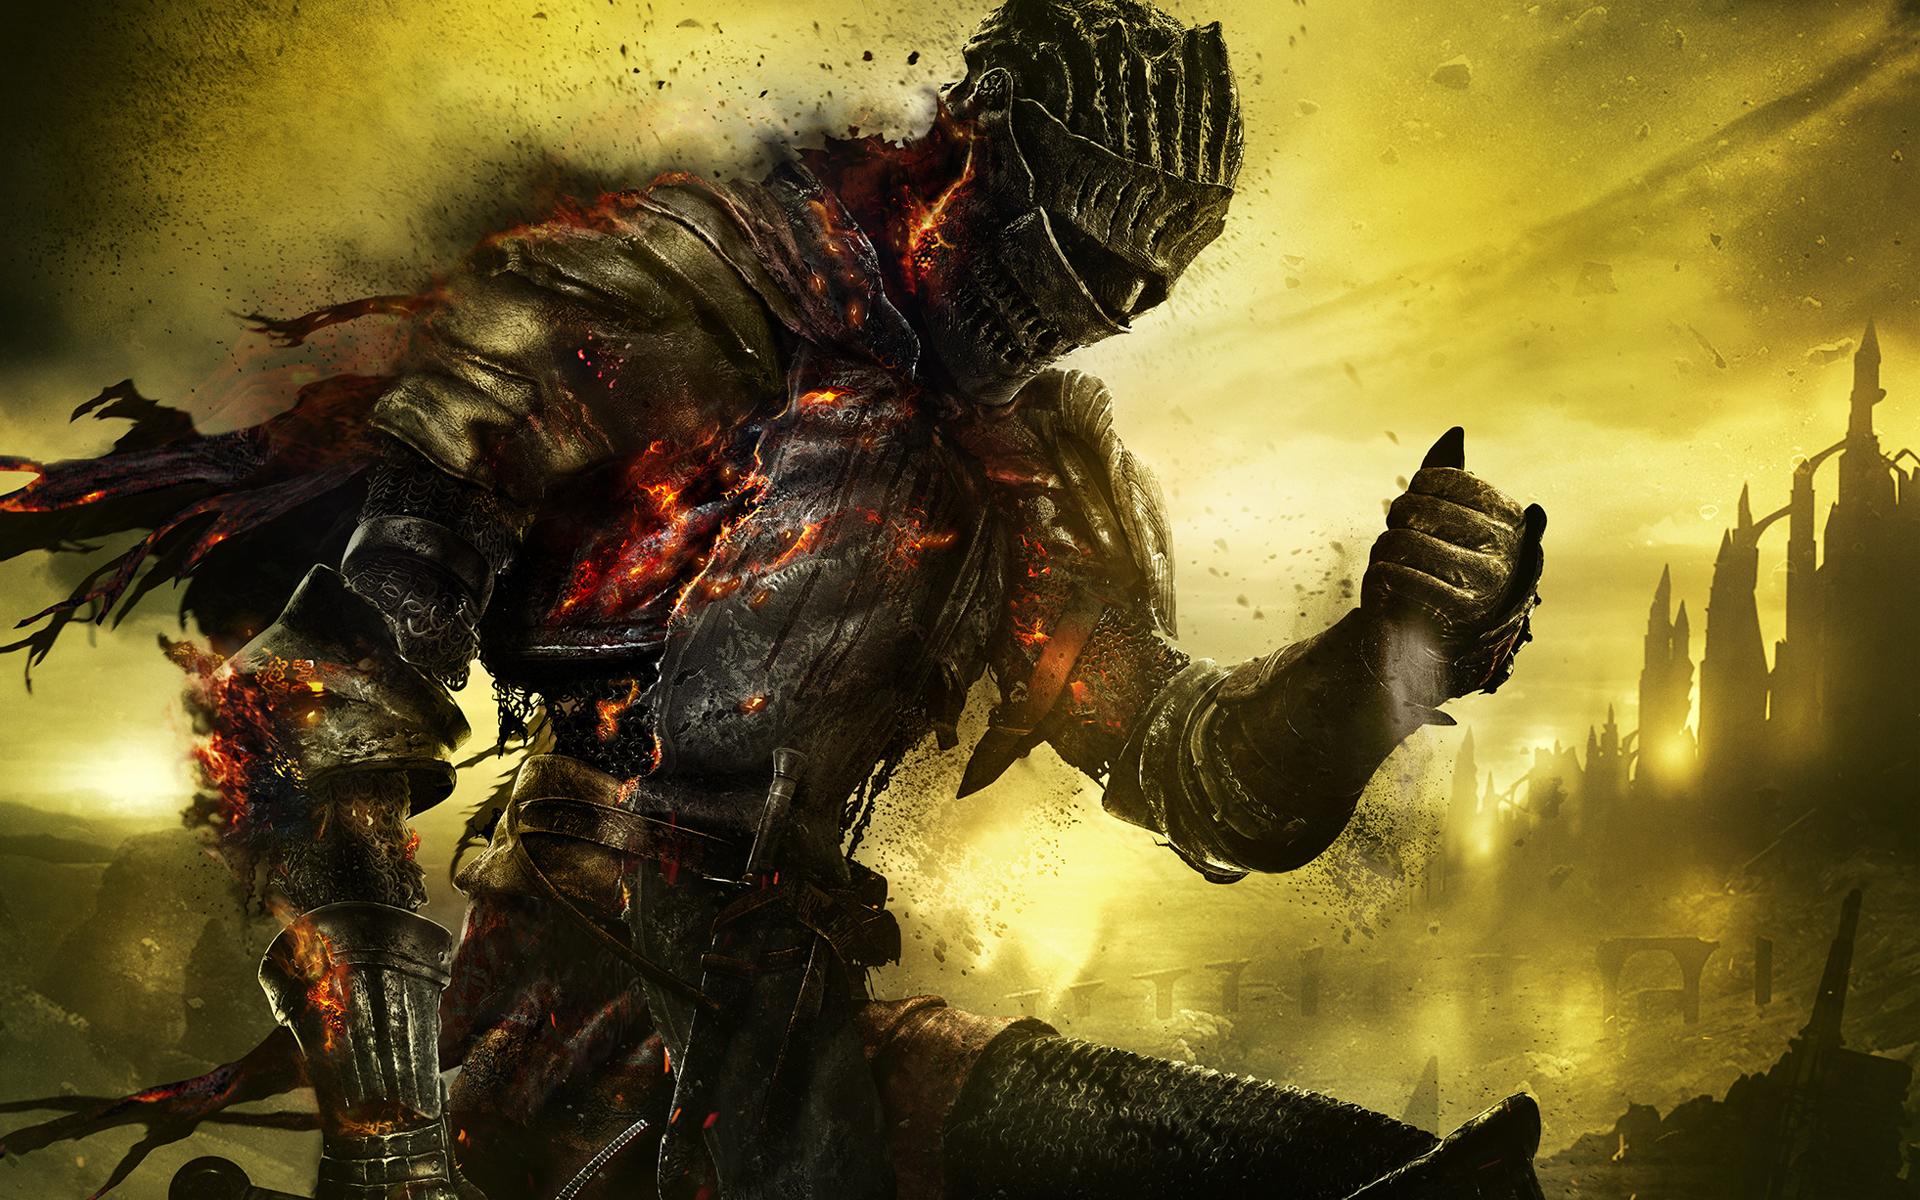 Dark Souls 3 Wallpapers HD